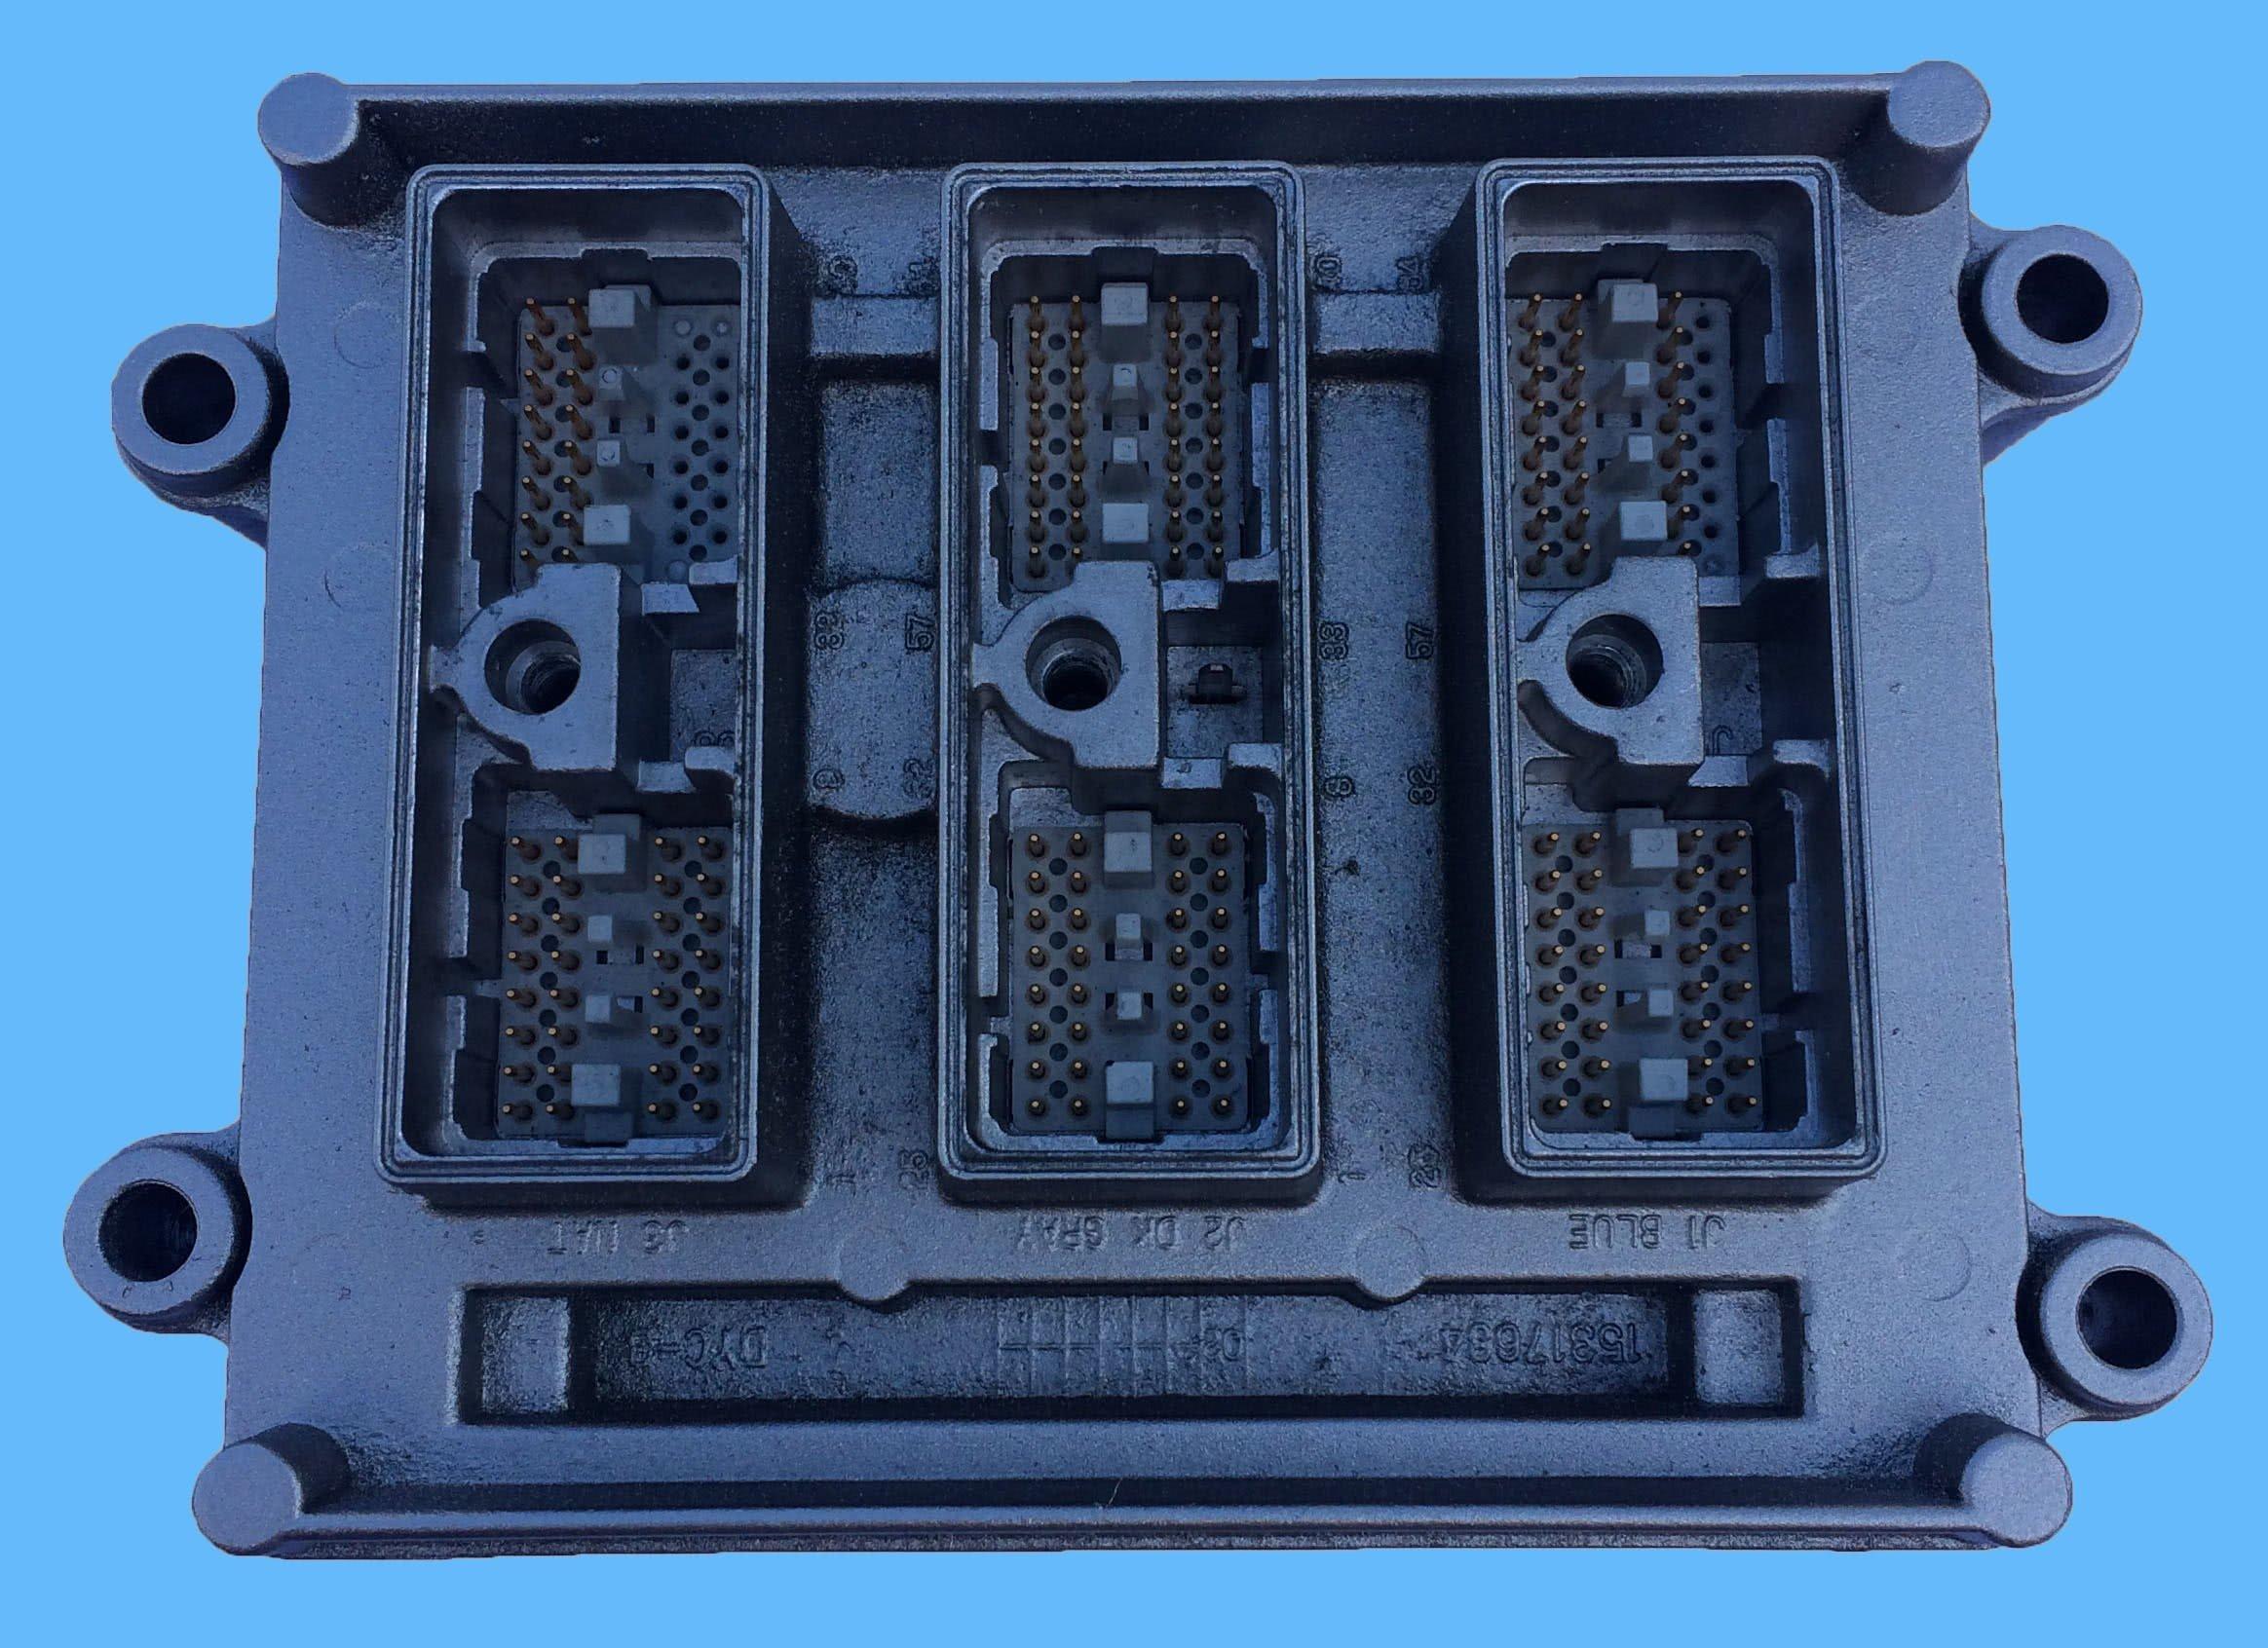 2003 Chevrolet Trailblazer 4.3L V6 Gas Engine Control Module ECM / ECU - Engine Control Module